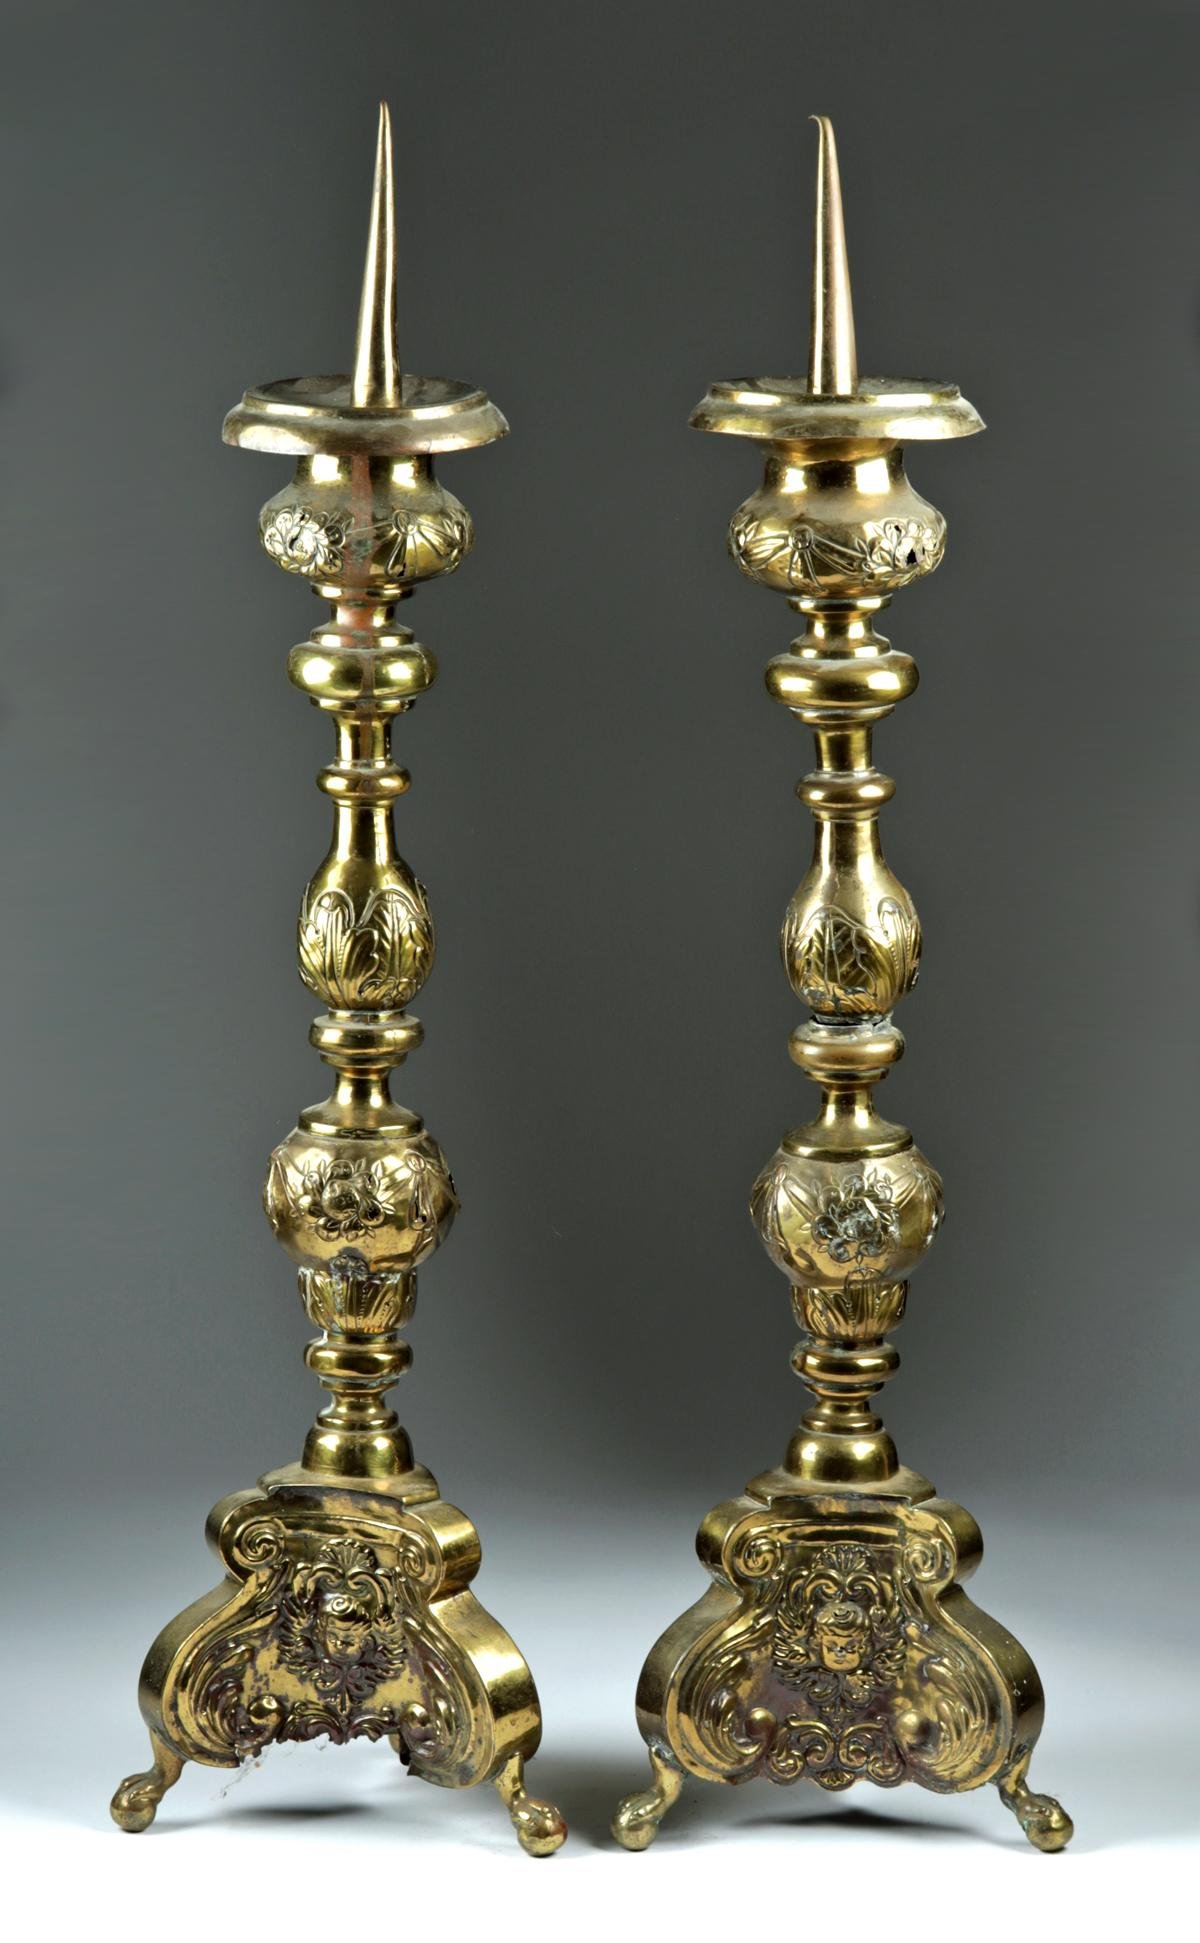 18th C. Italian Brass Prickets / Altar Sticks (pr)